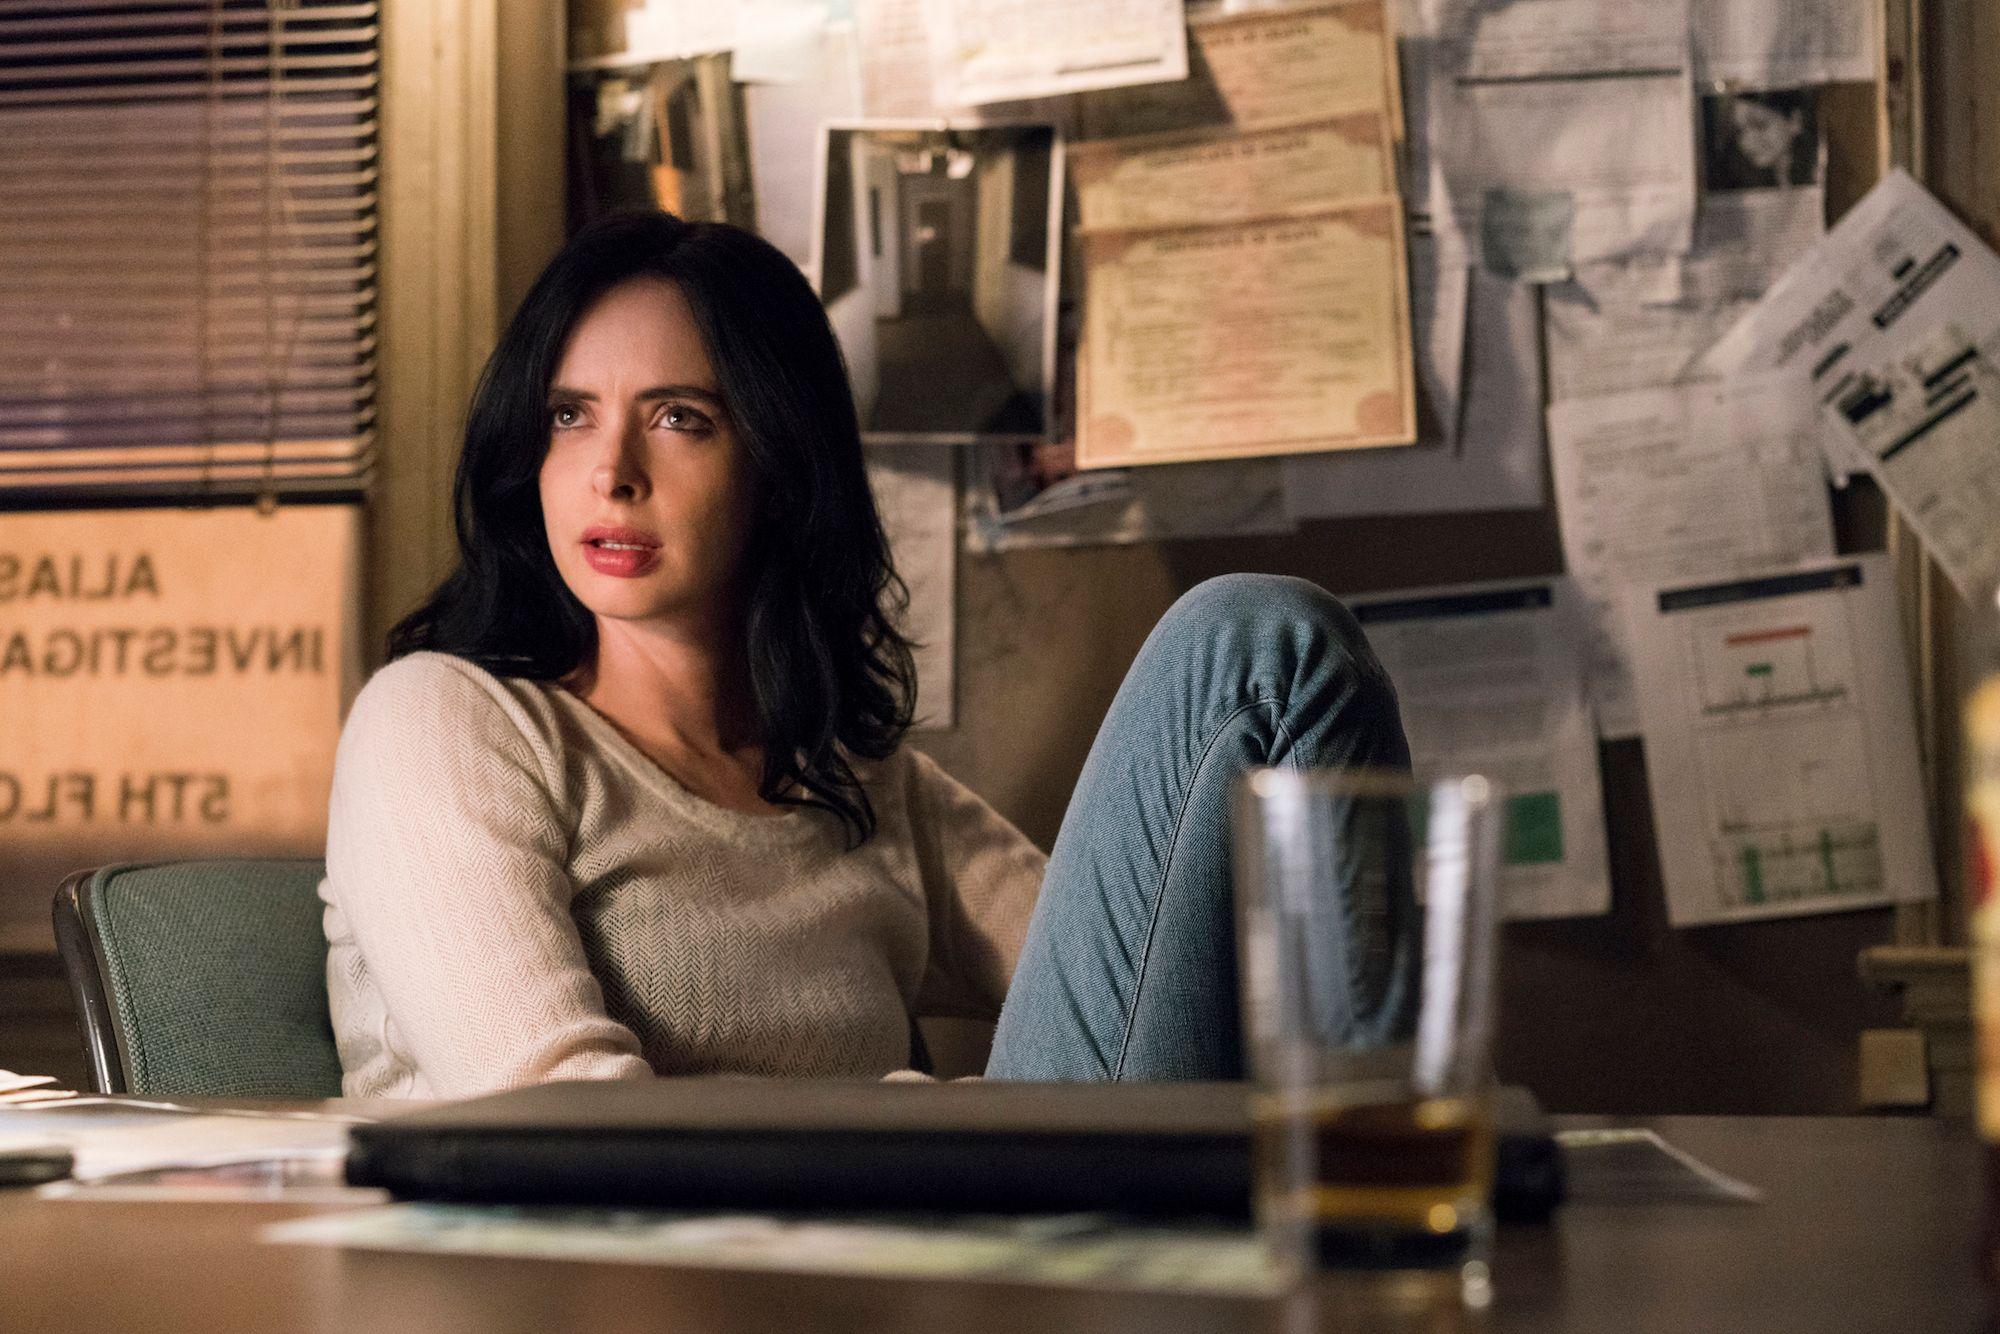 jessica jones season 2 image 4 - 'Jessica Jones' Season 2 Trailer Finds Jessica Investigating Her Origin Story